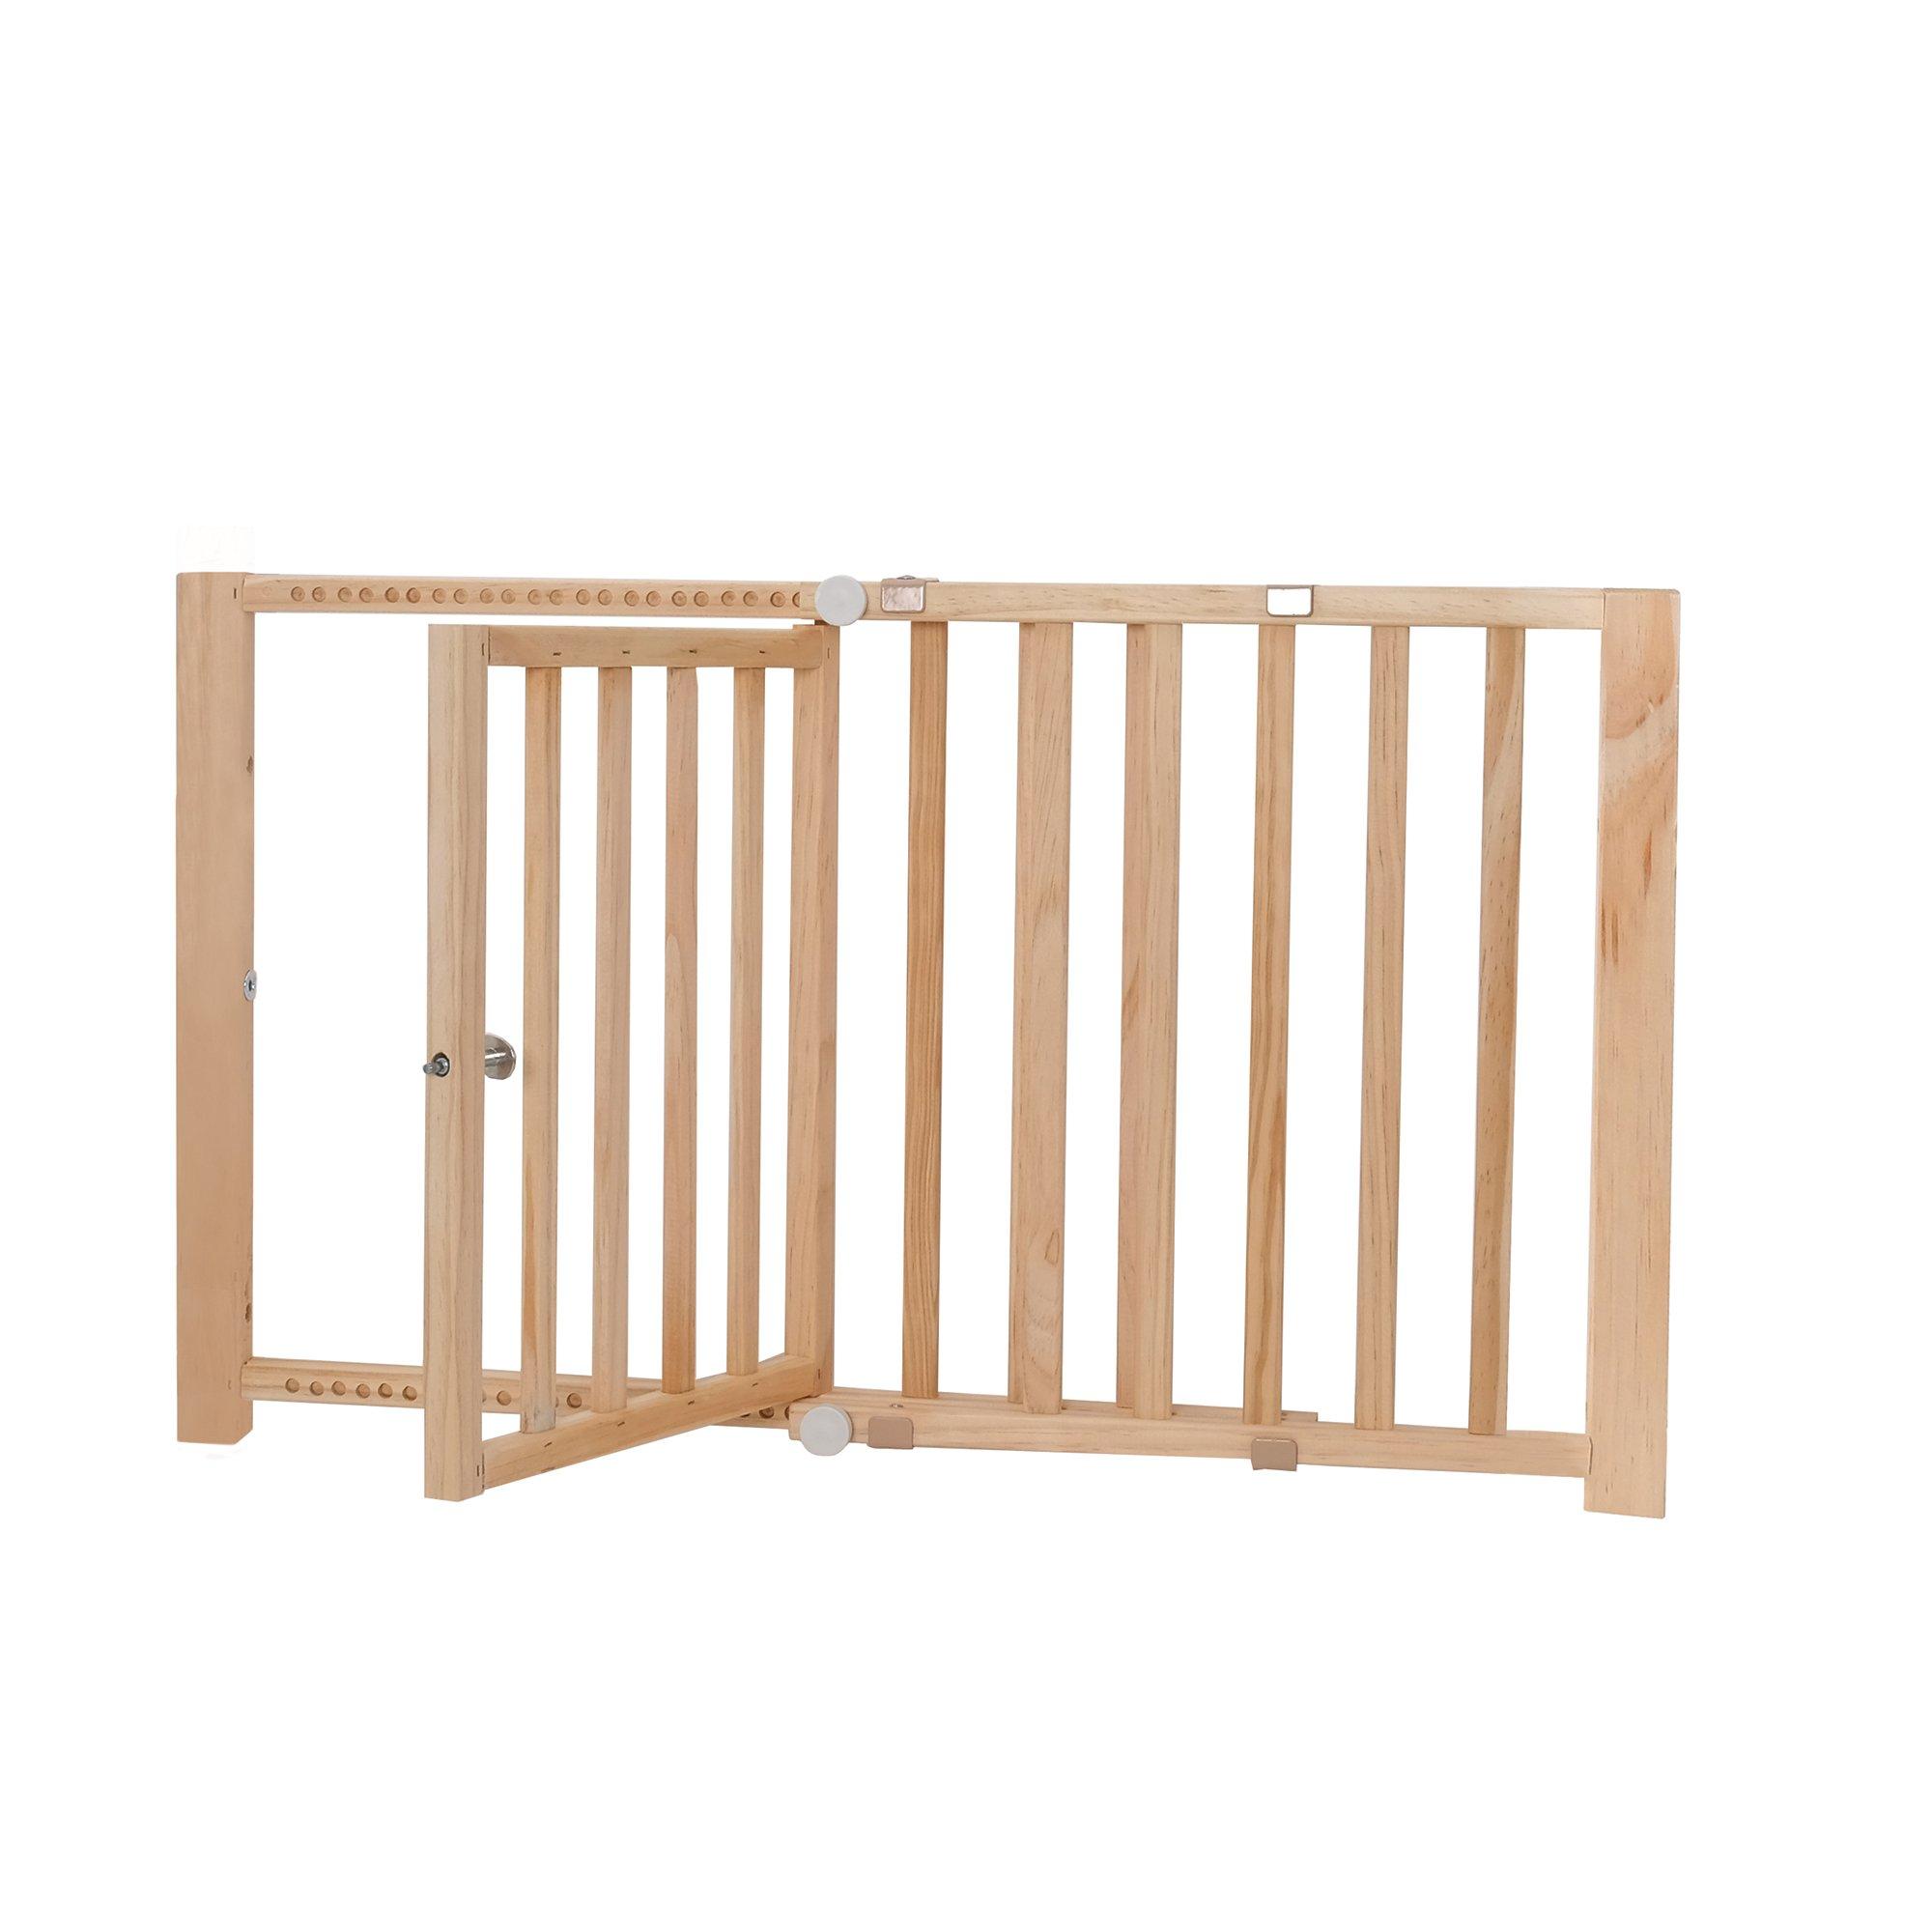 Dogit 70621 Pet Safety Gate, 28-44 W x 18'' H